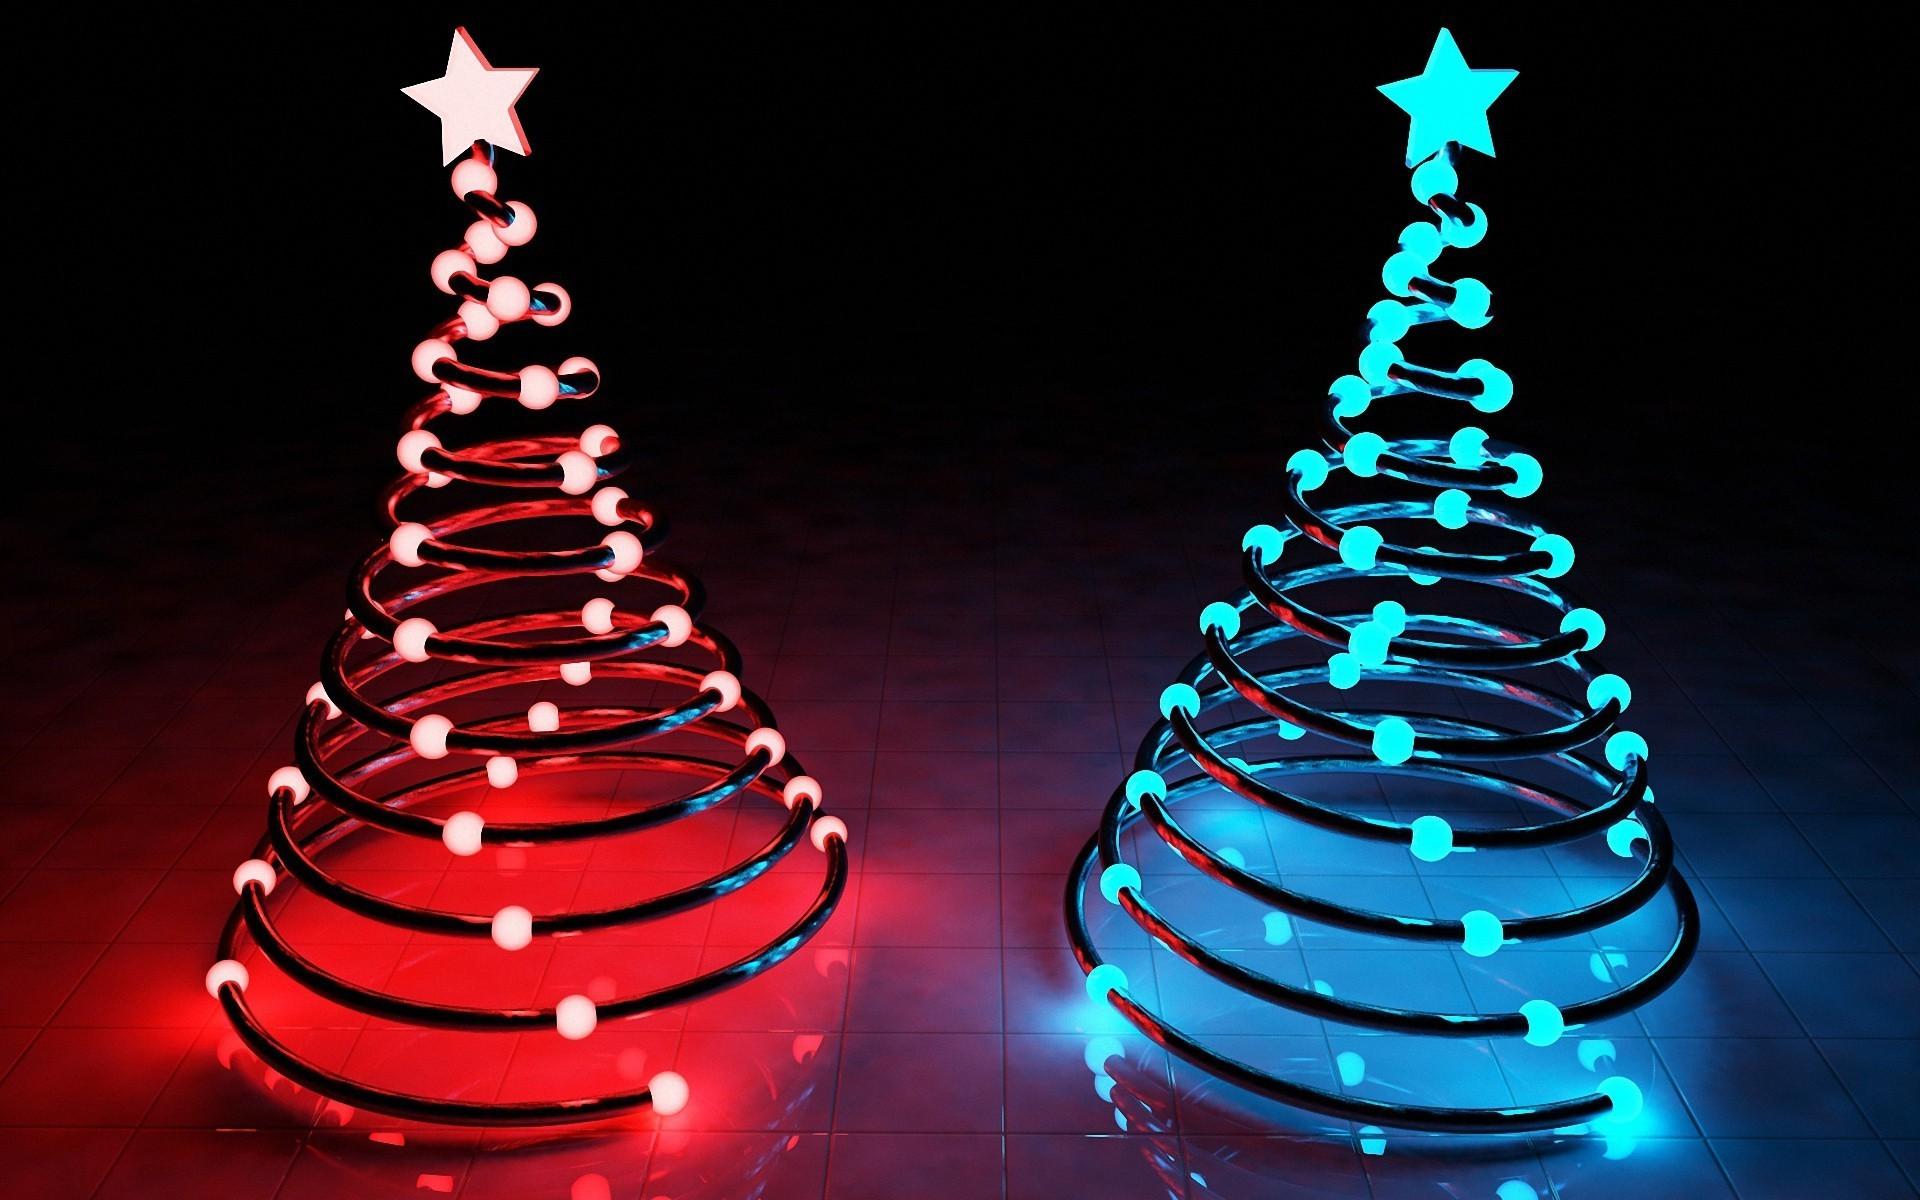 Ipad Christmas Wallpaper Hd: HD Christmas Wallpaper ·① Download Free Cool Full HD